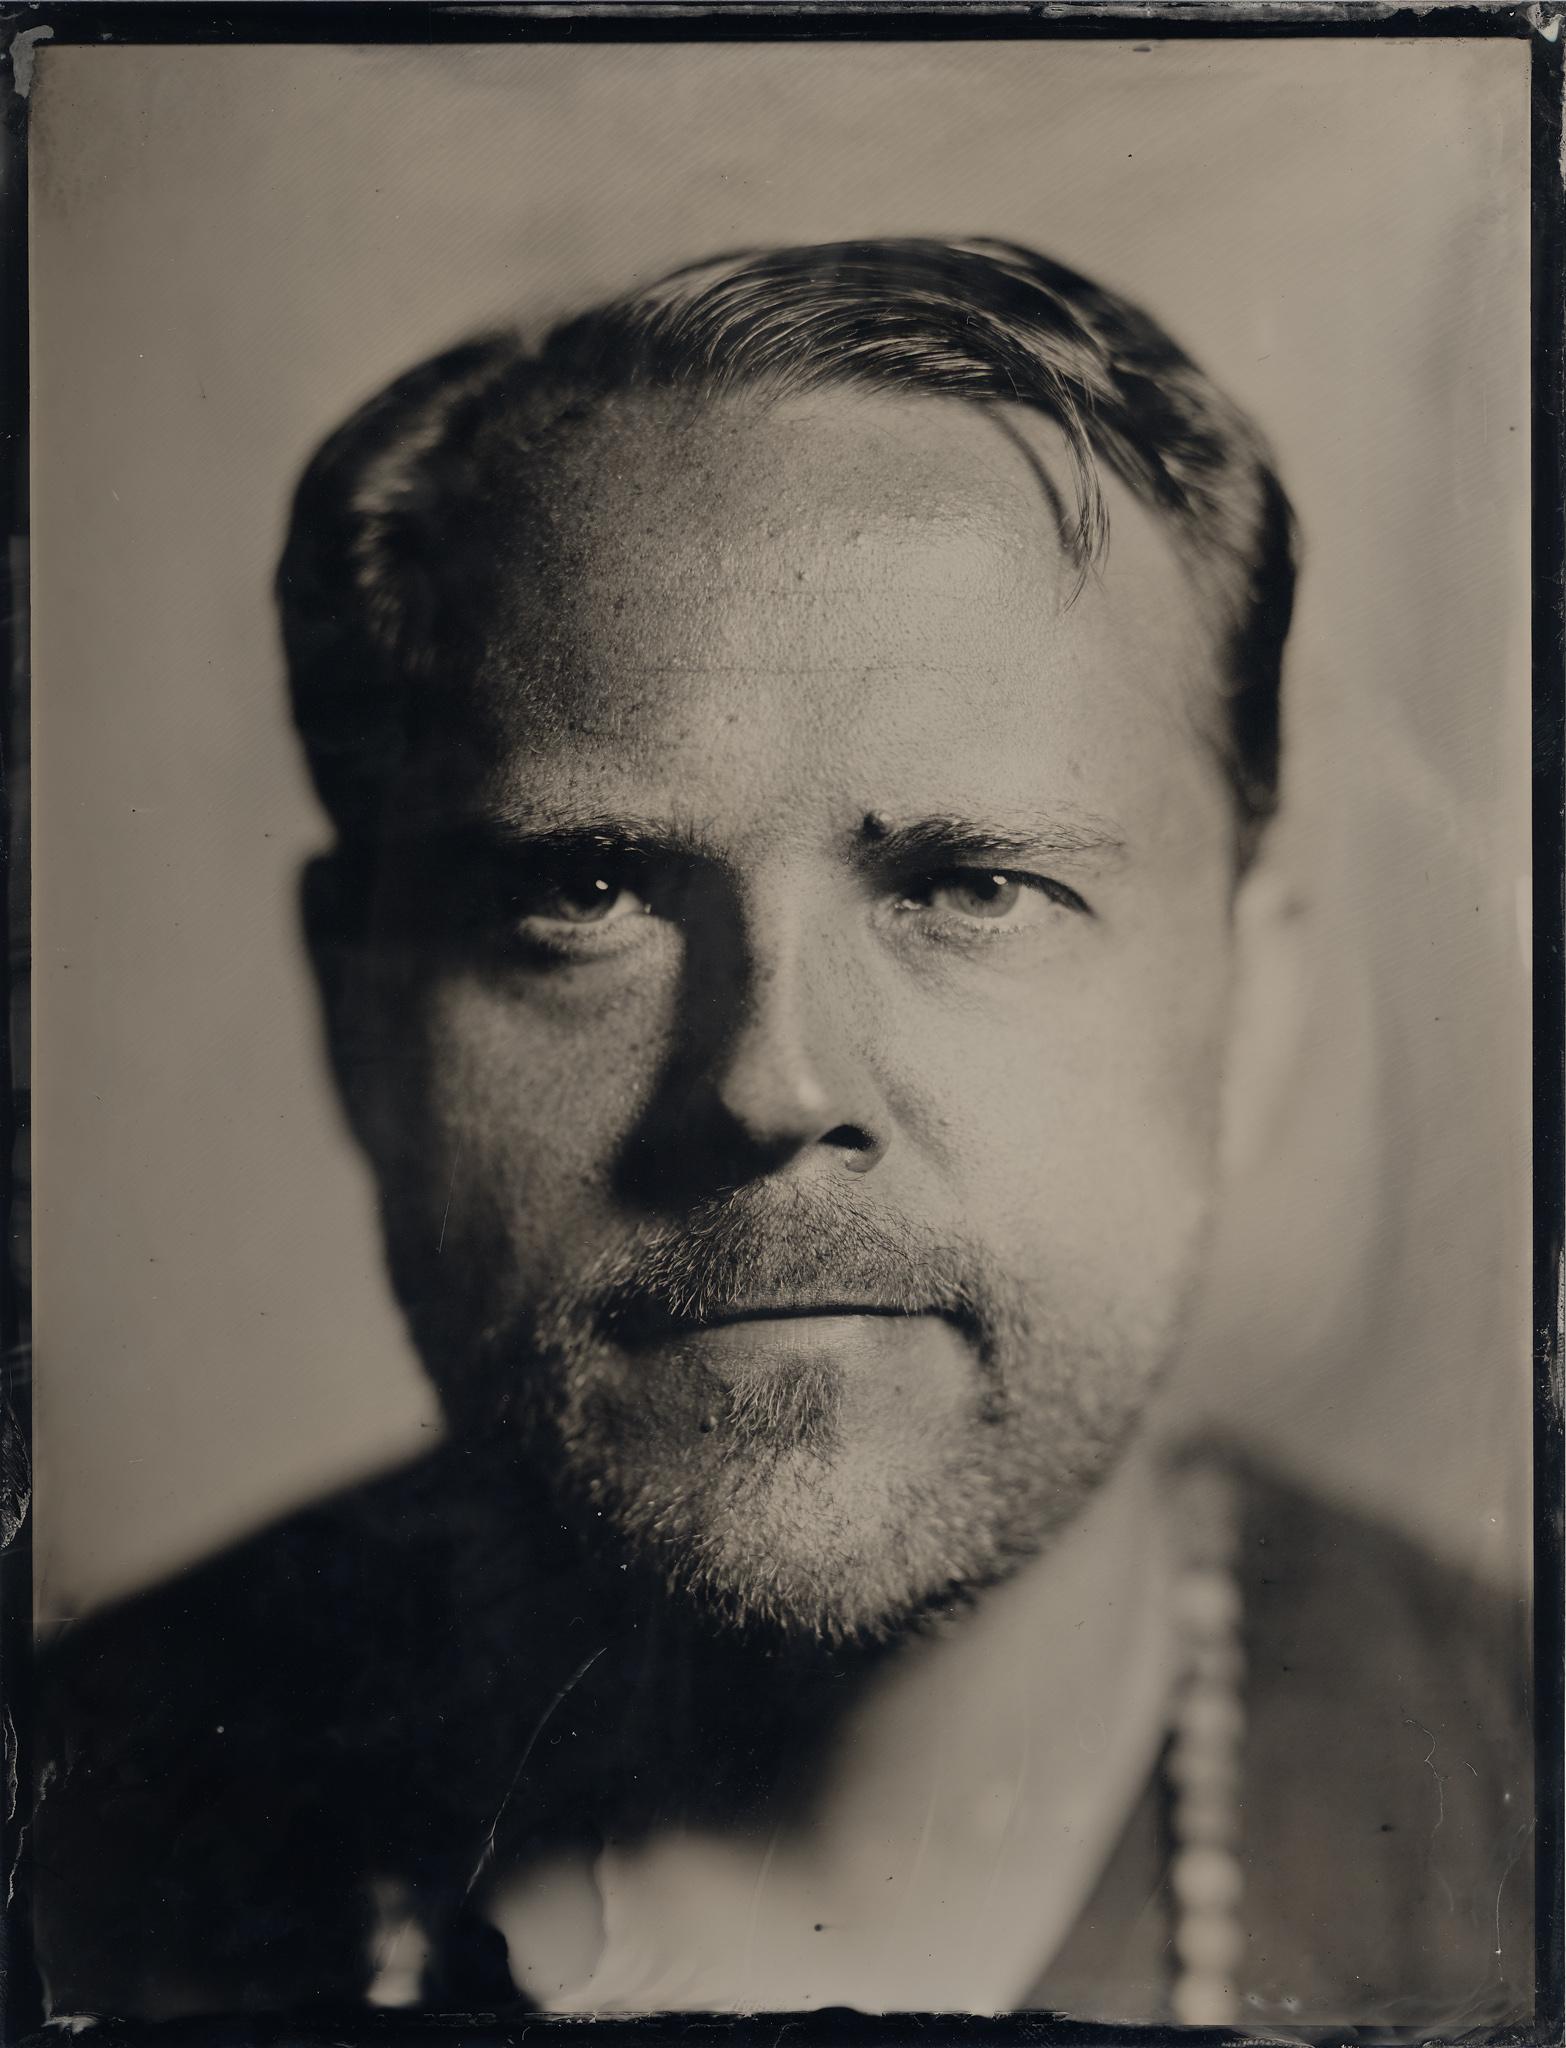 Chris Nowakowski